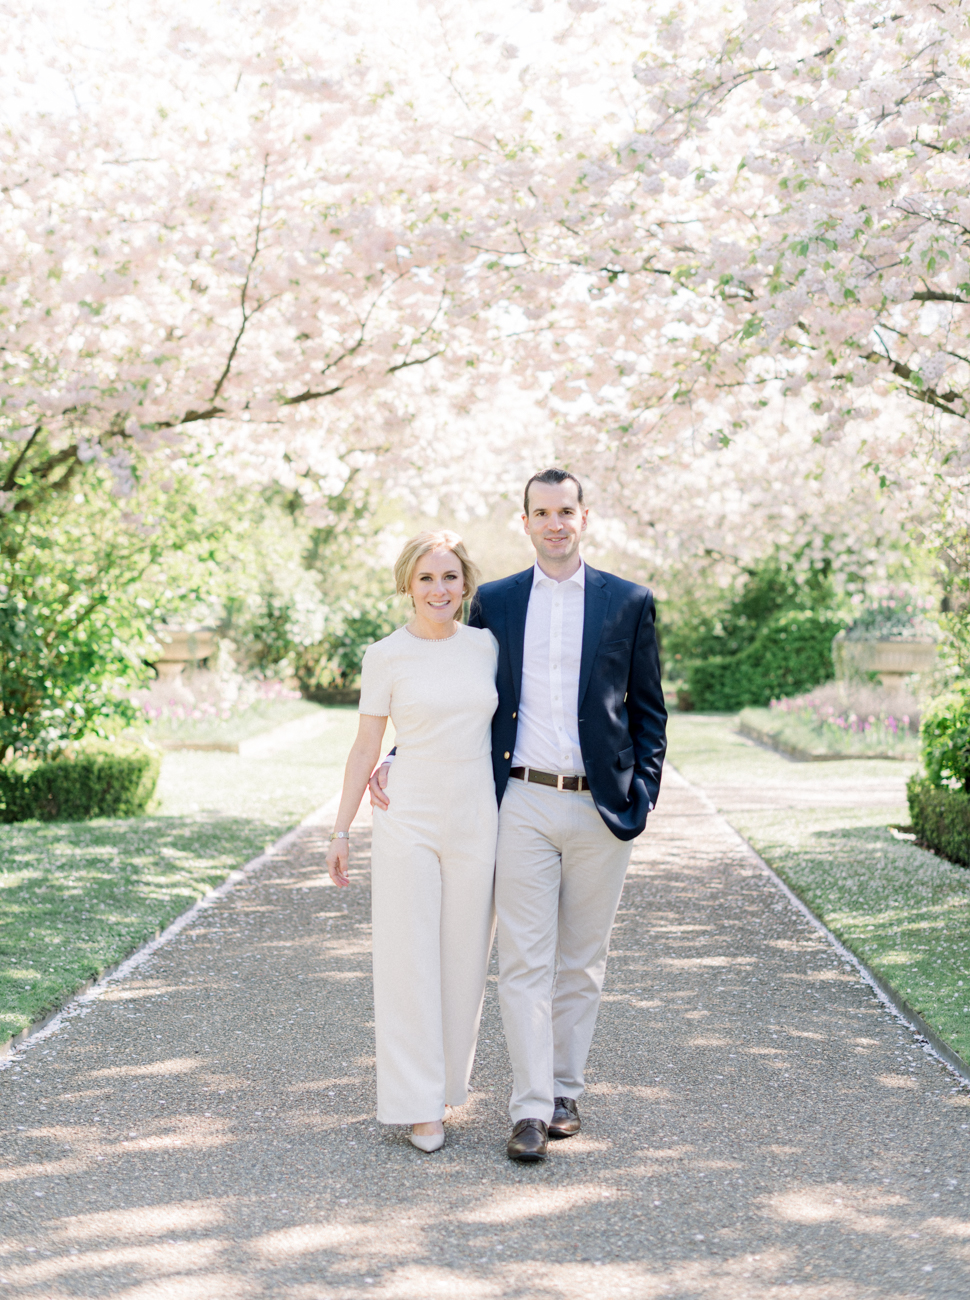 Julie Michaelsen Photography - London Engagement Photos - Rebecca K Events - London Wedding Planner